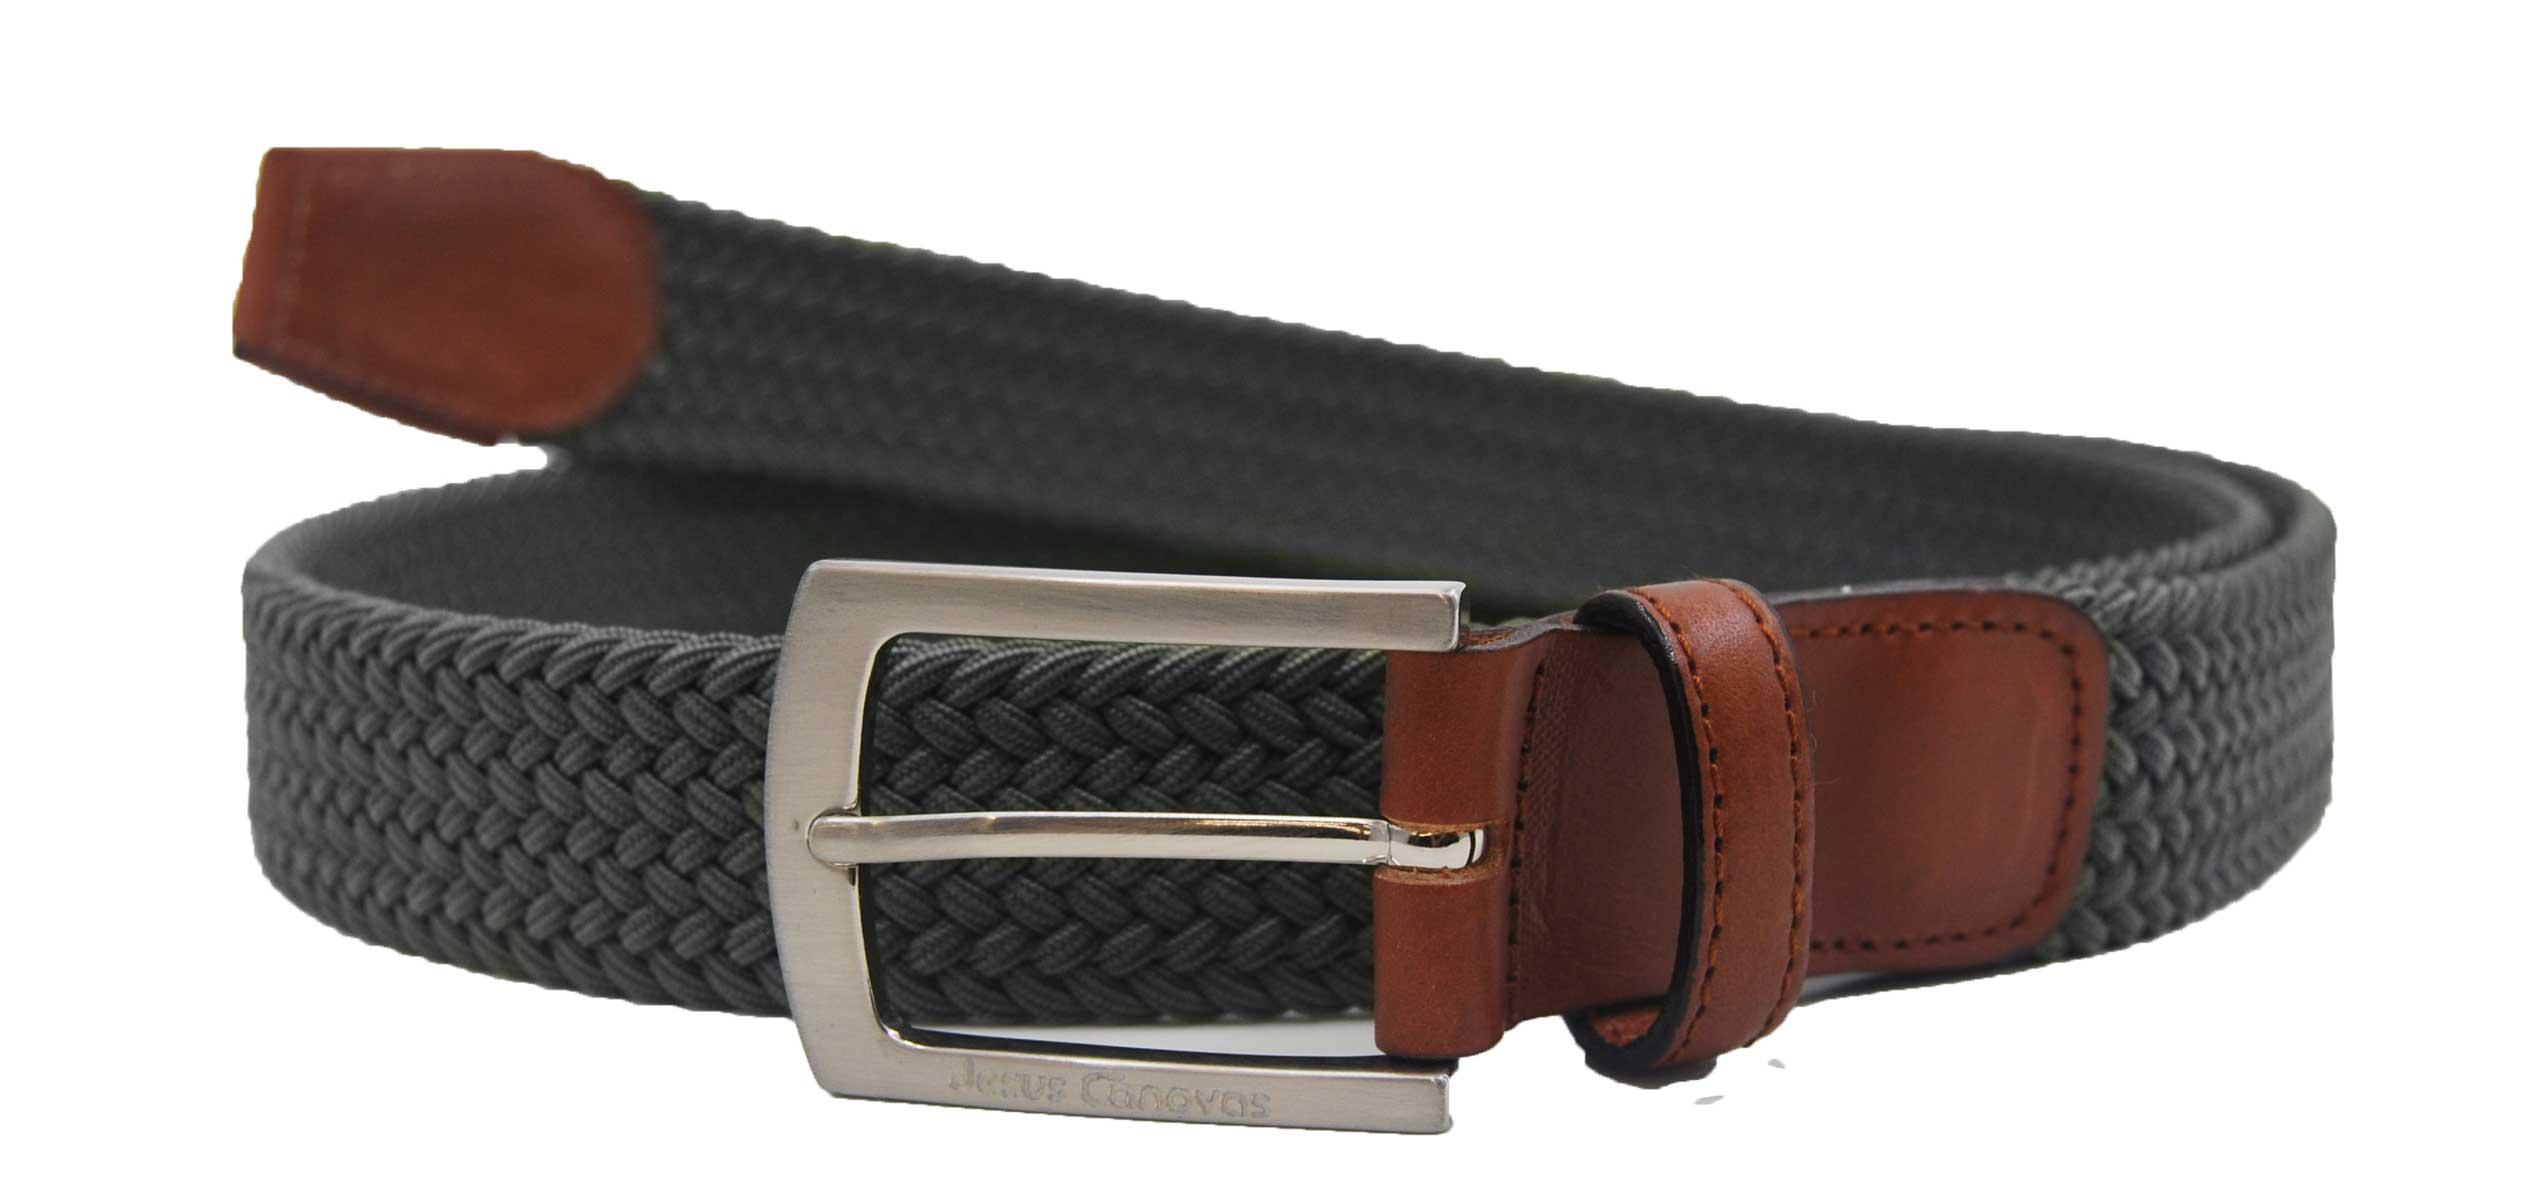 Foto 1 de Elastic Braided Belt Green english